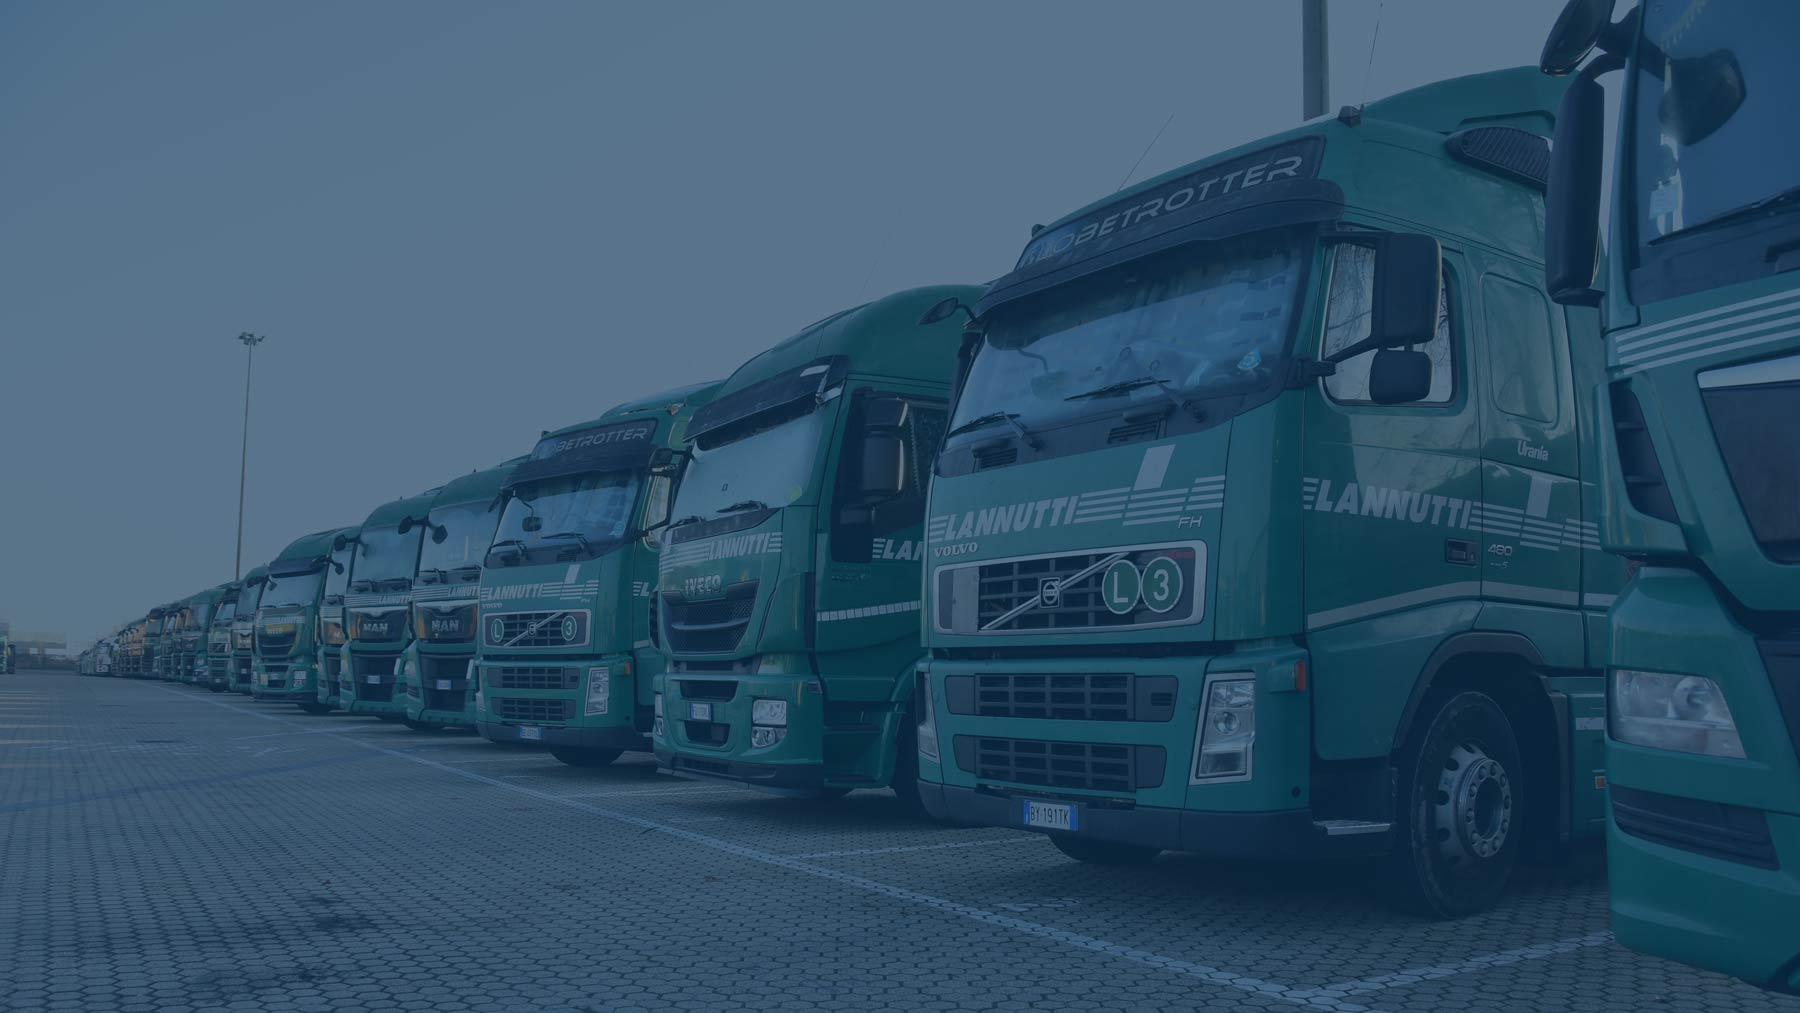 jetfreight-freight-forwarders-malta-customs-road-shipping-to-malta